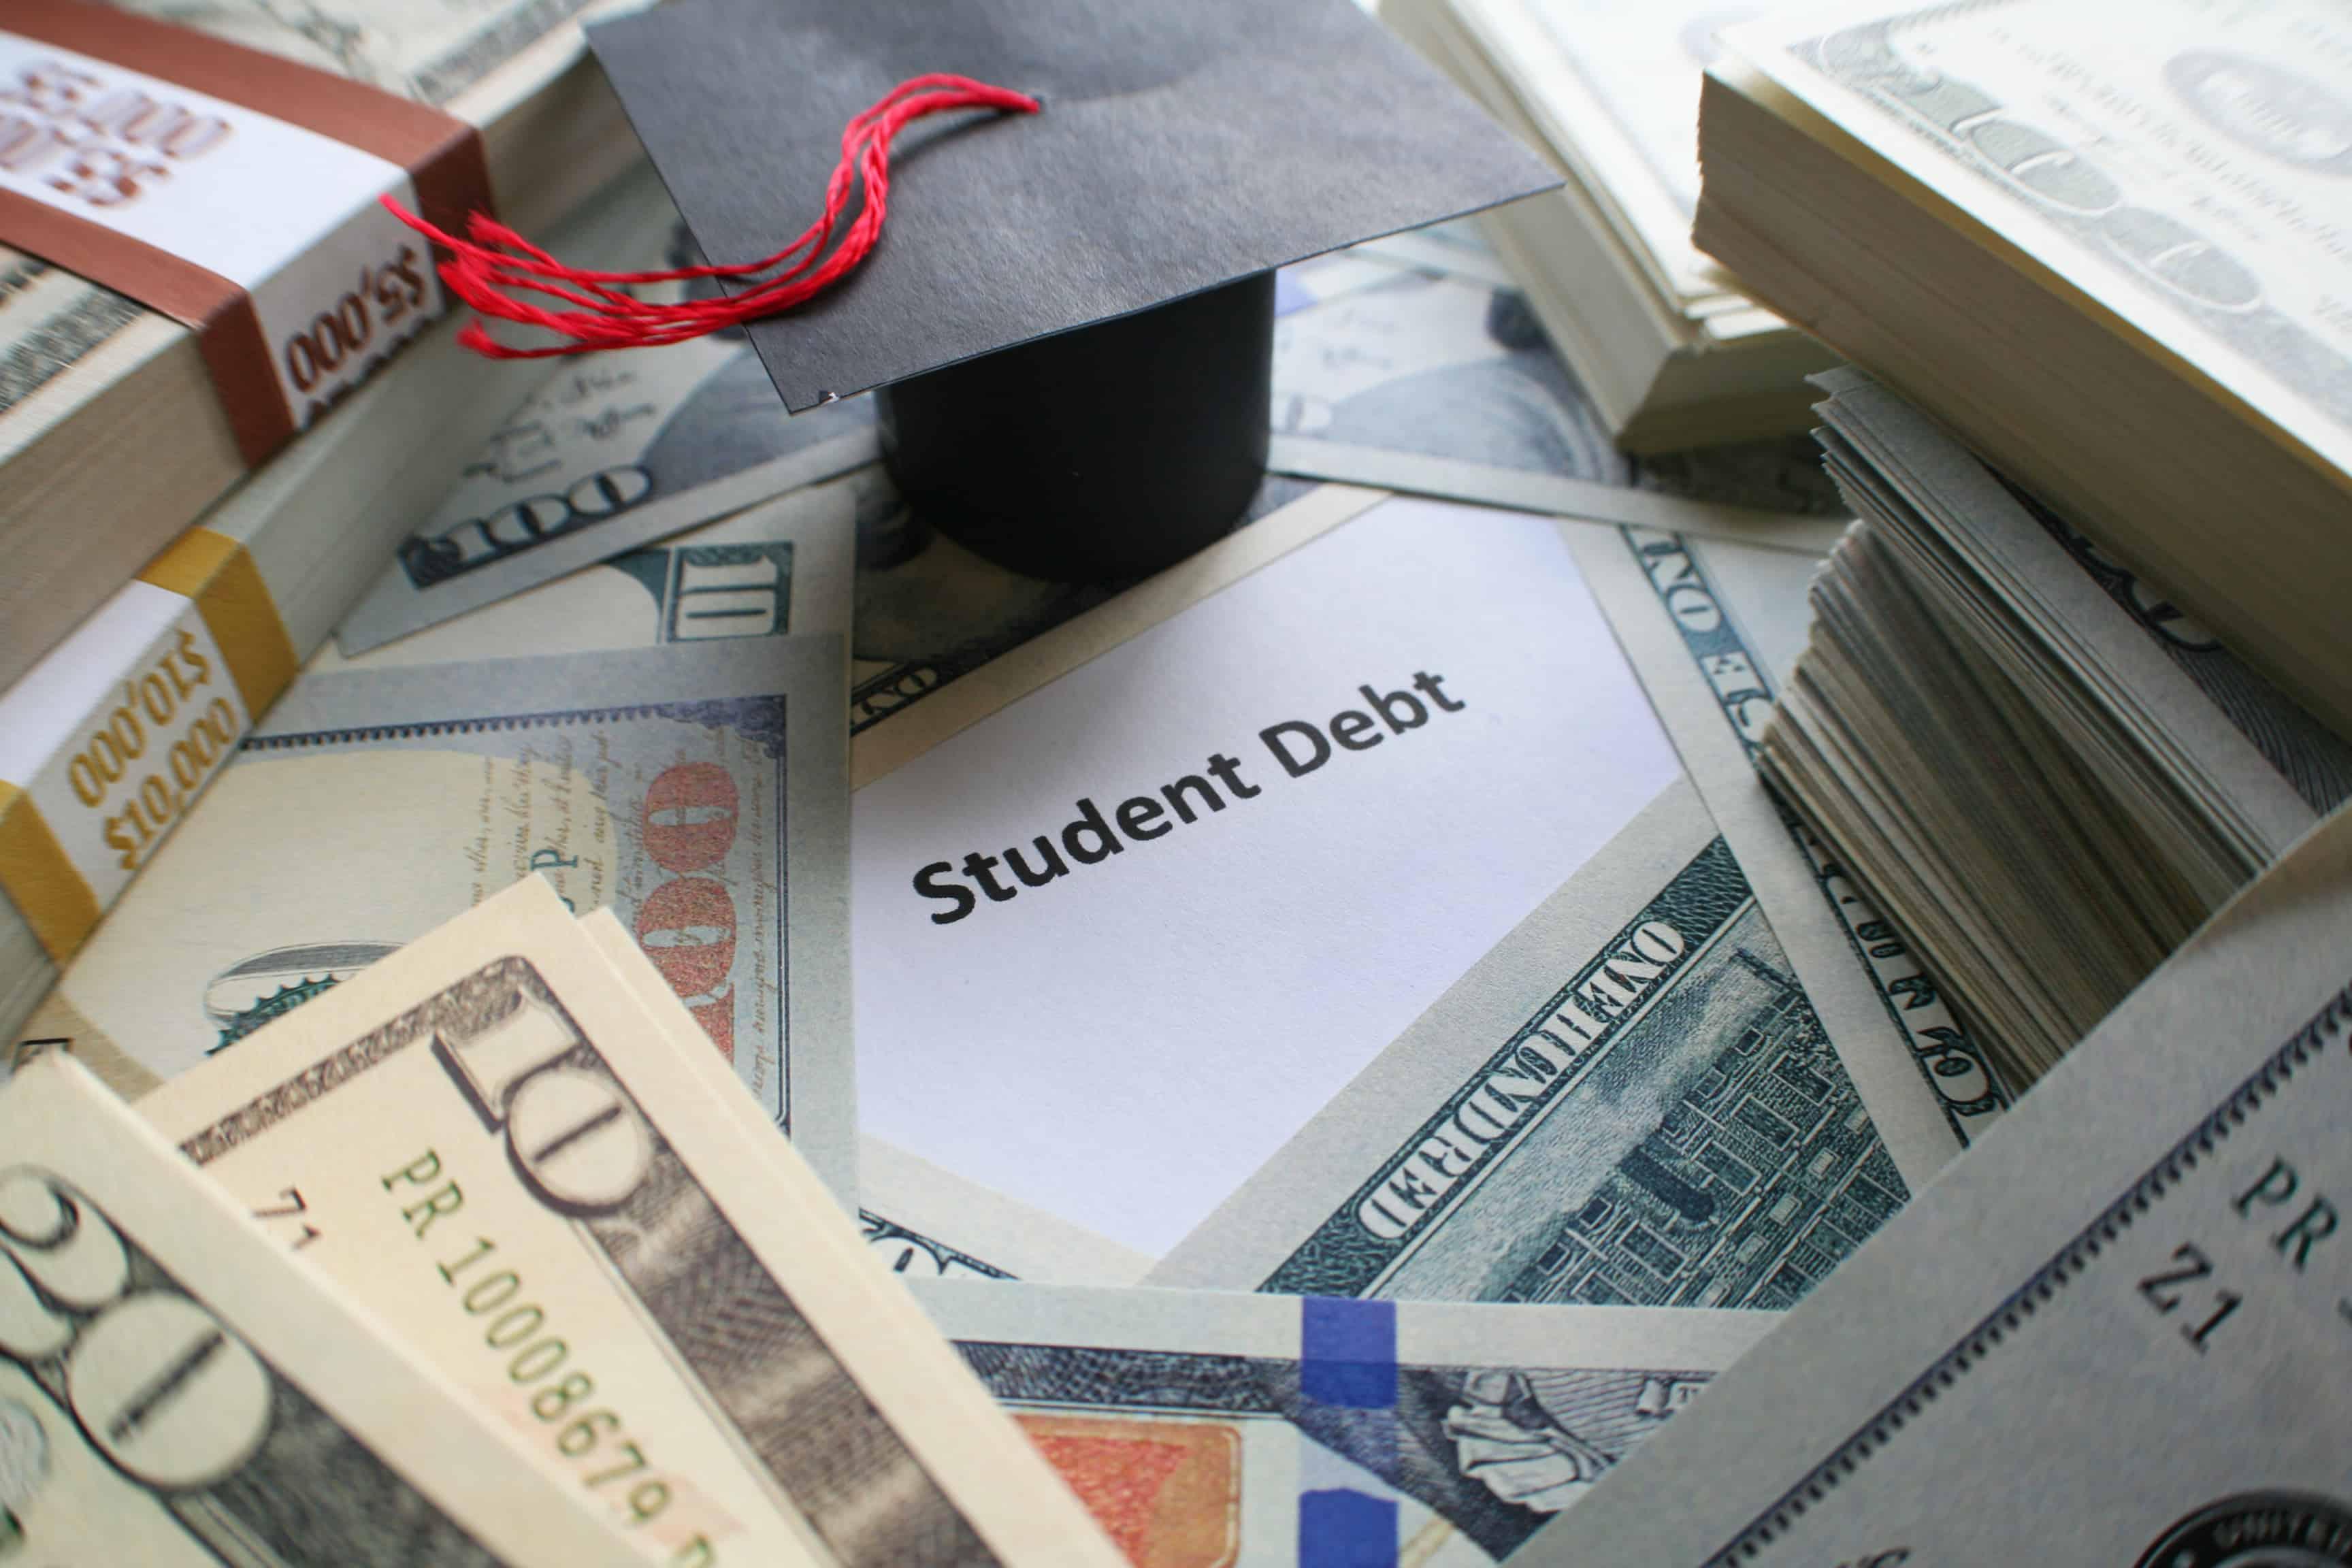 Graduation cap and cash sit on top paper reading